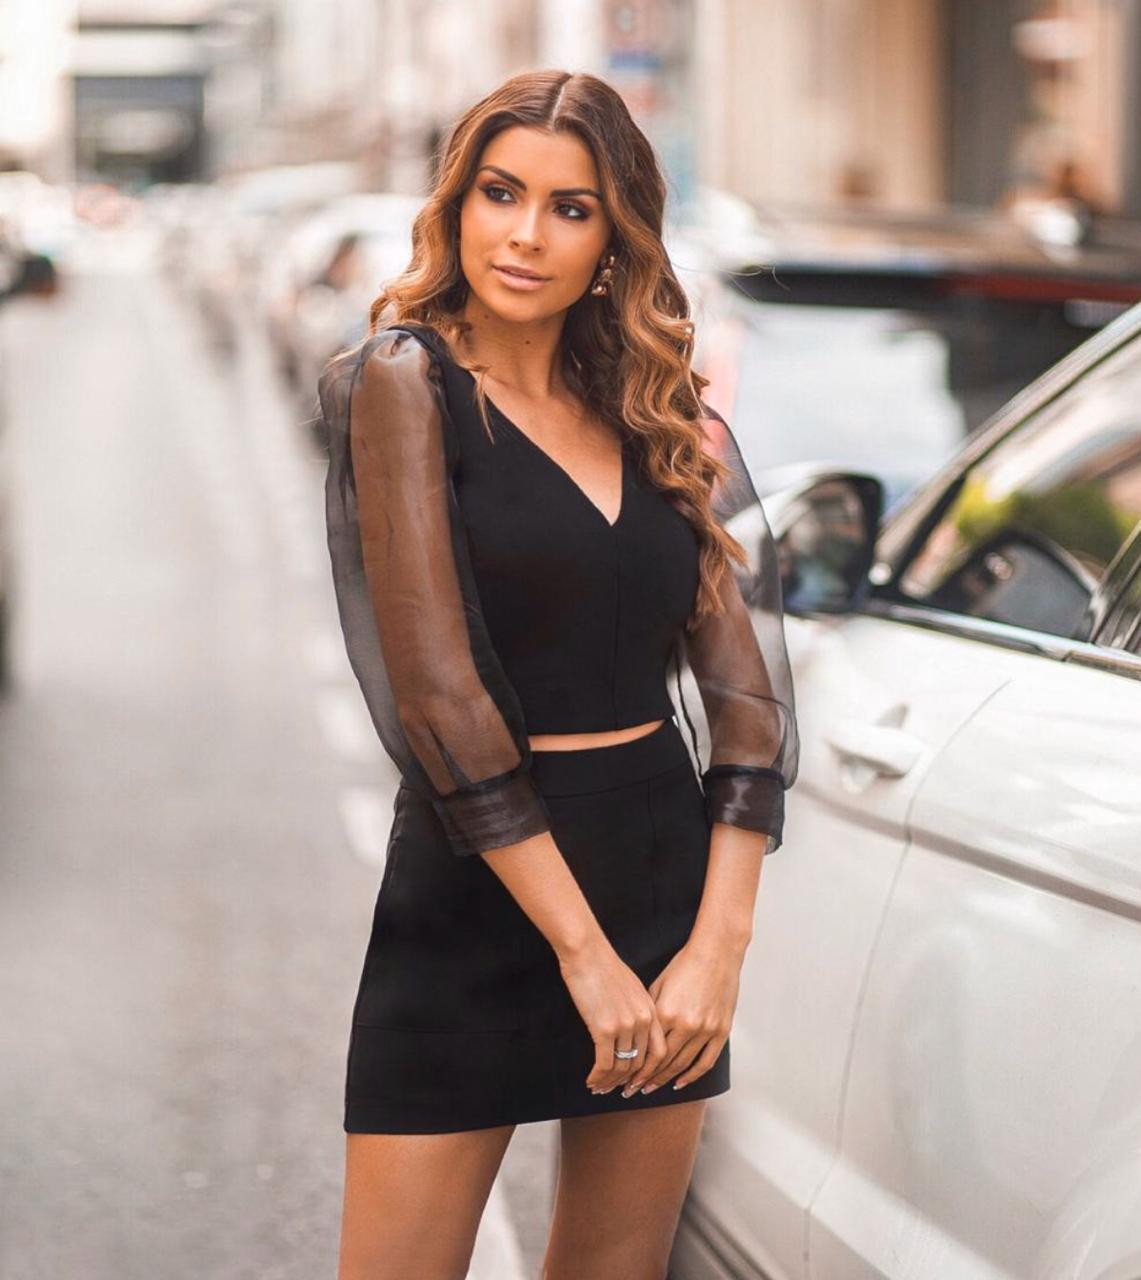 Blusa Adriana Mix Bandagem Organza 68% Viscose 27% Poliamida 5% Elastano